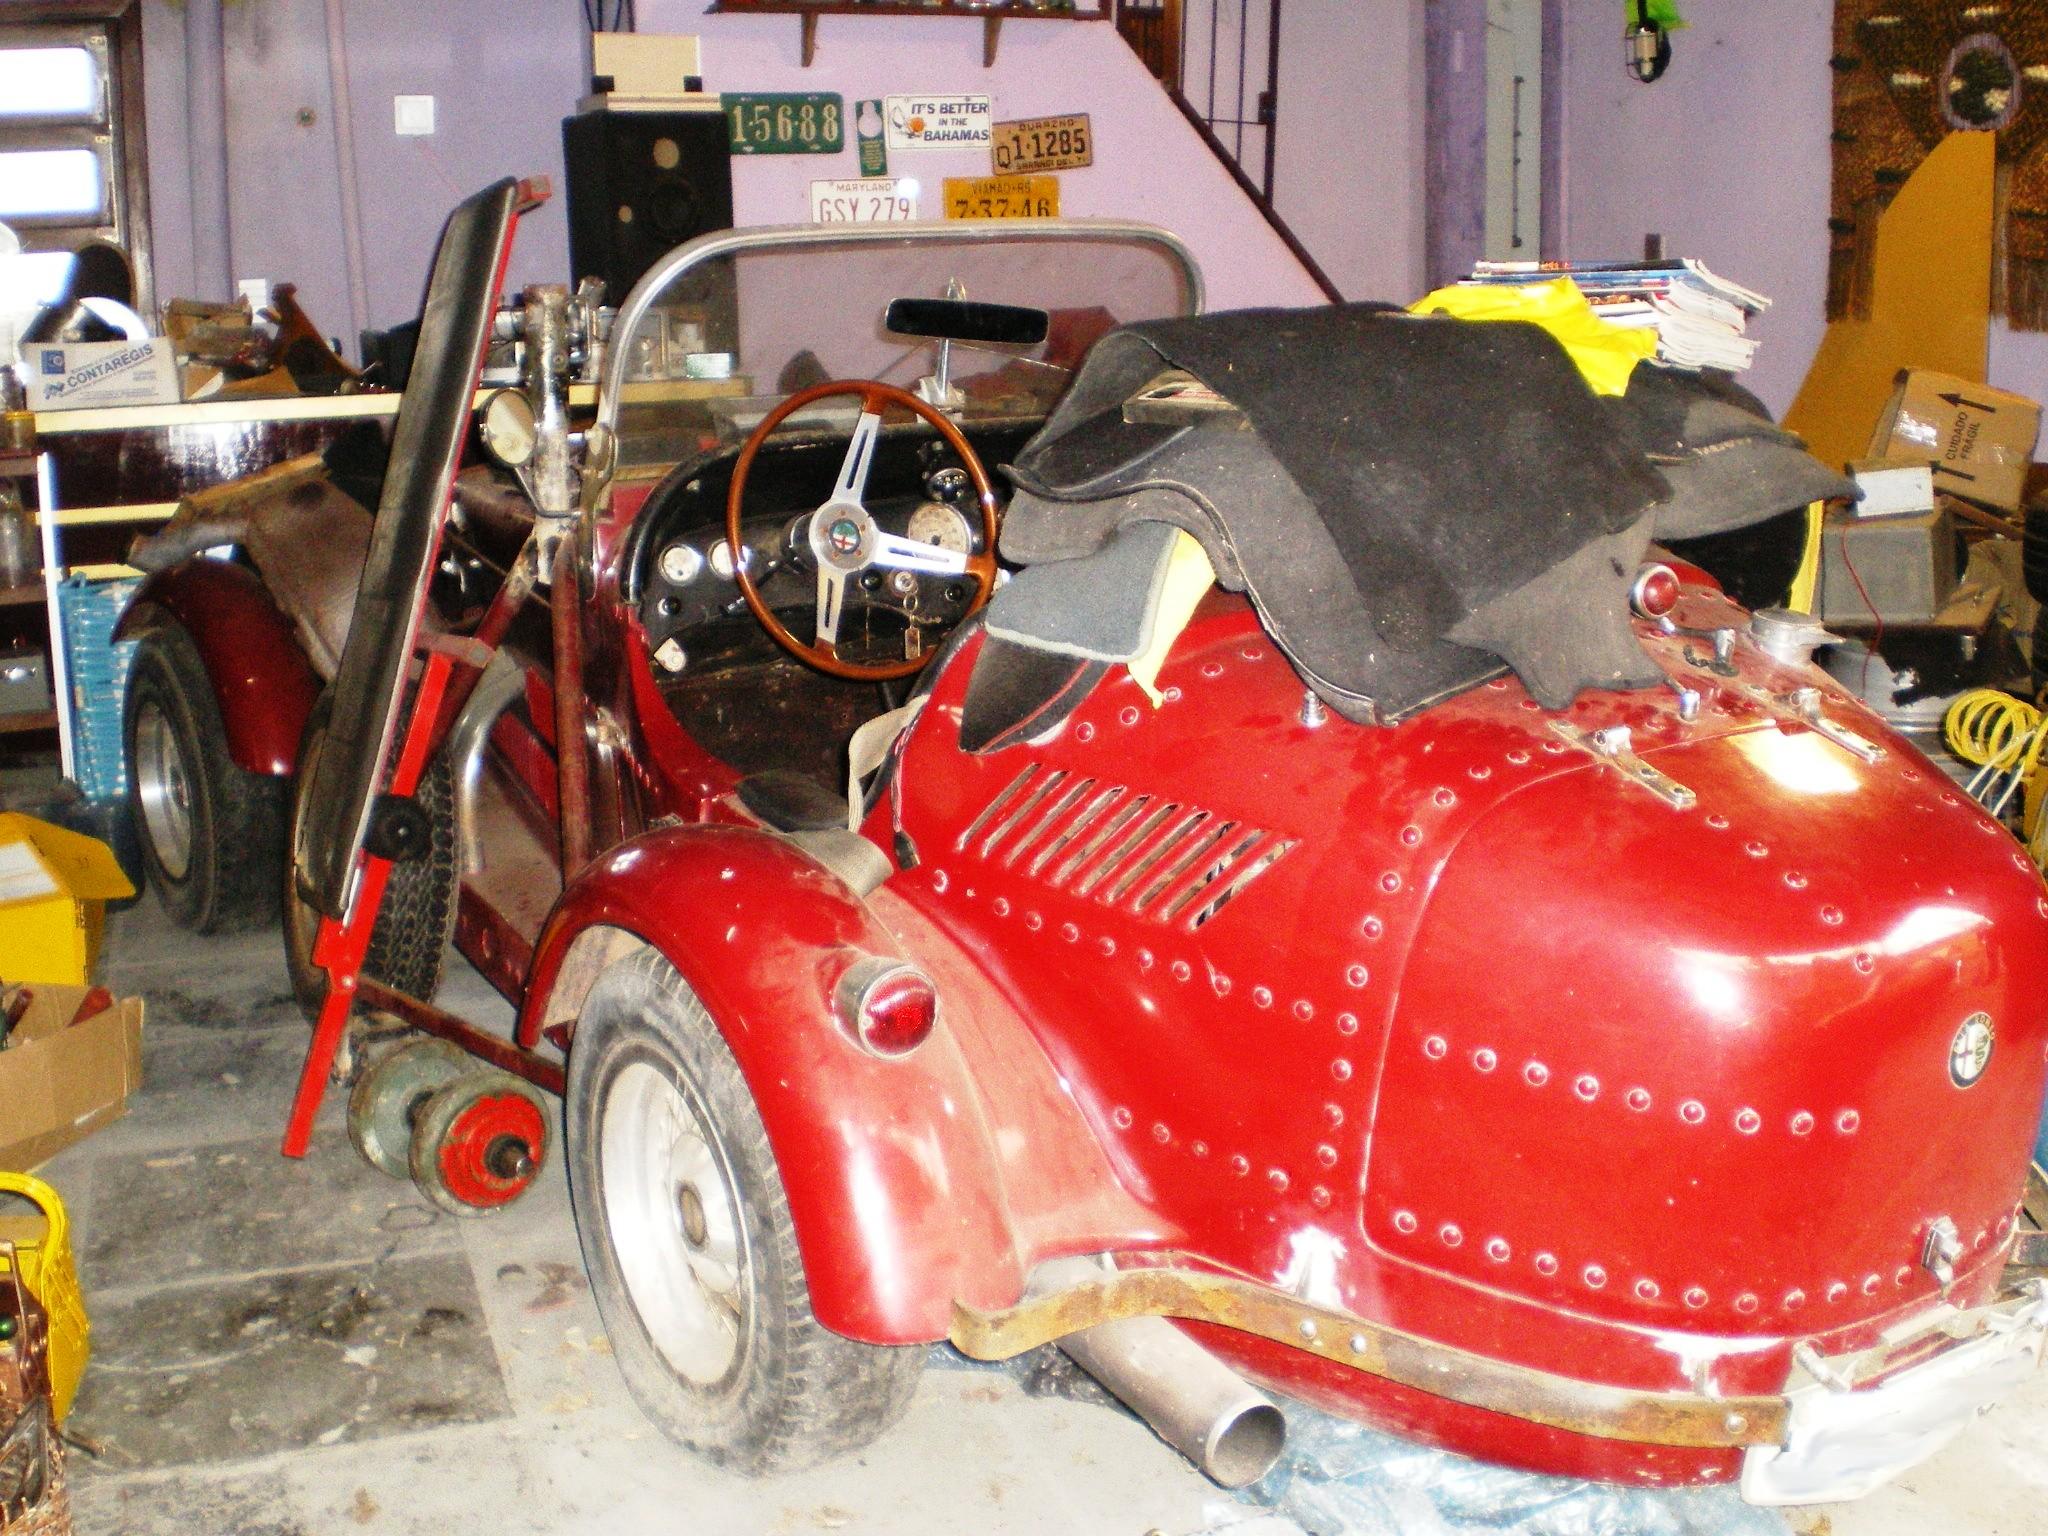 mf-sap-alfa-romeo-ventura1 POST 700! L'automobile Ventura - réplica Alfa Romeo 1931